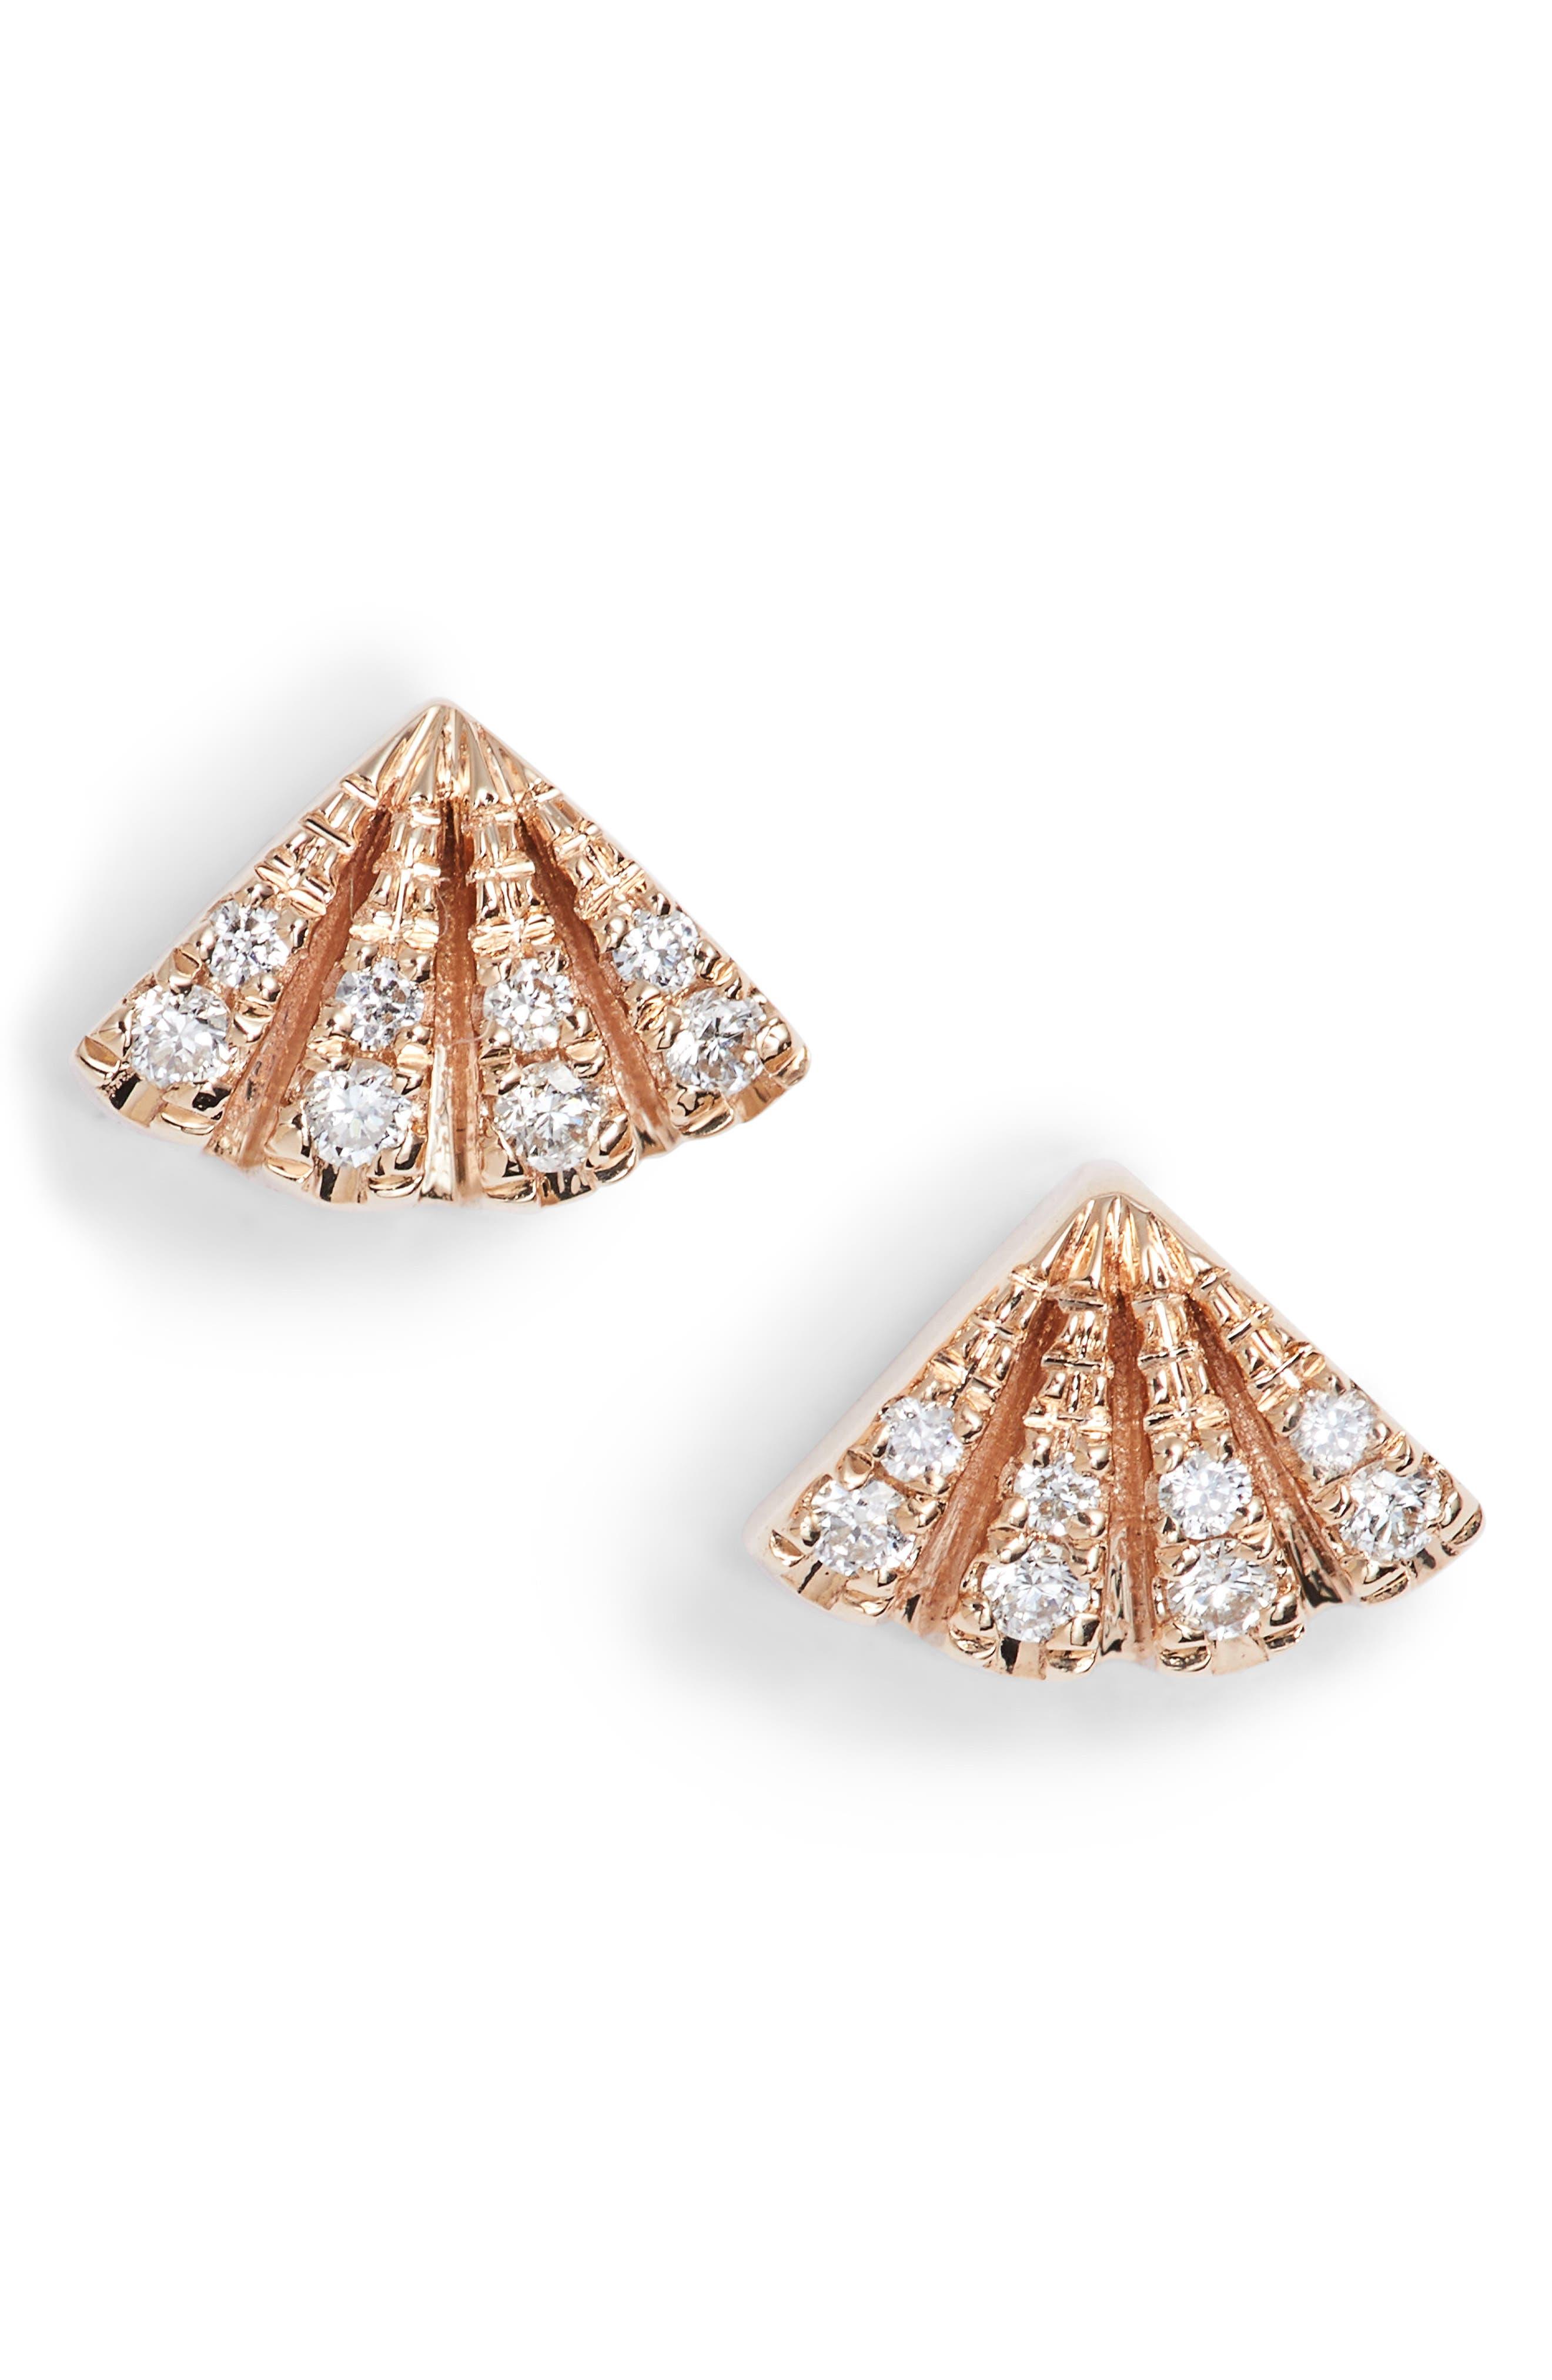 Dana Rebecca Isla Rio Diamond Fan Stud Earrings,                         Main,                         color, Rose Gold